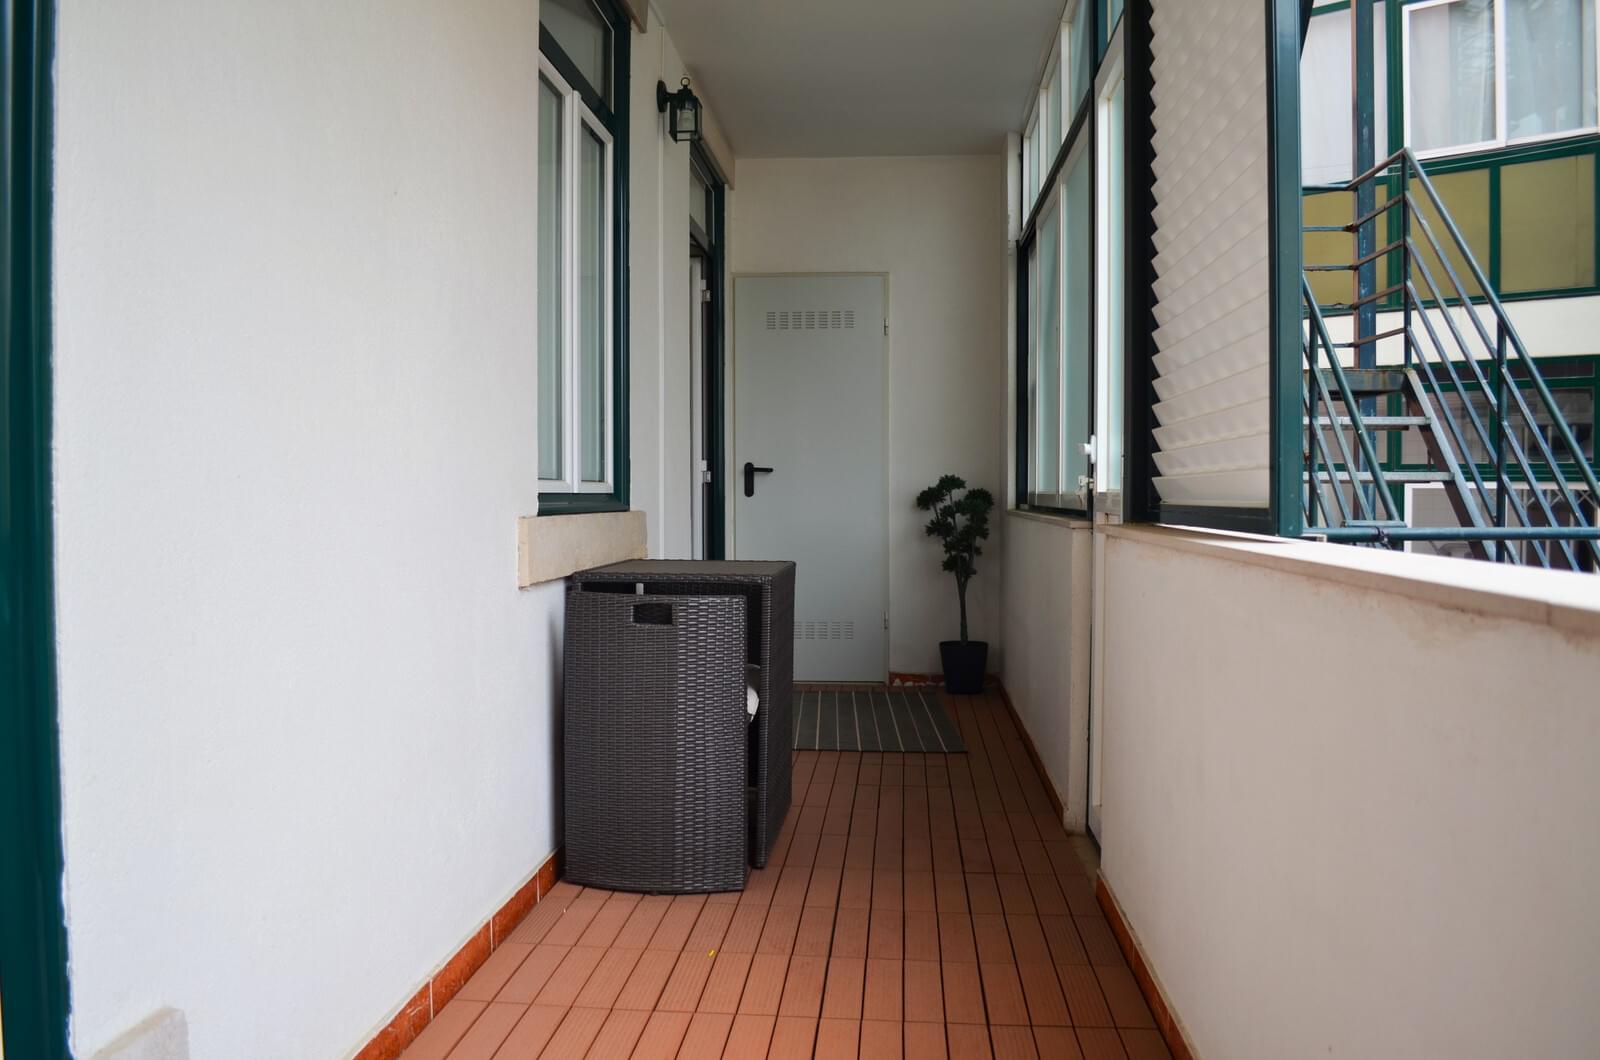 pf18839-apartamento-t2-lisboa-e51549d9-d4bf-4b1a-aebf-f090c9c19932